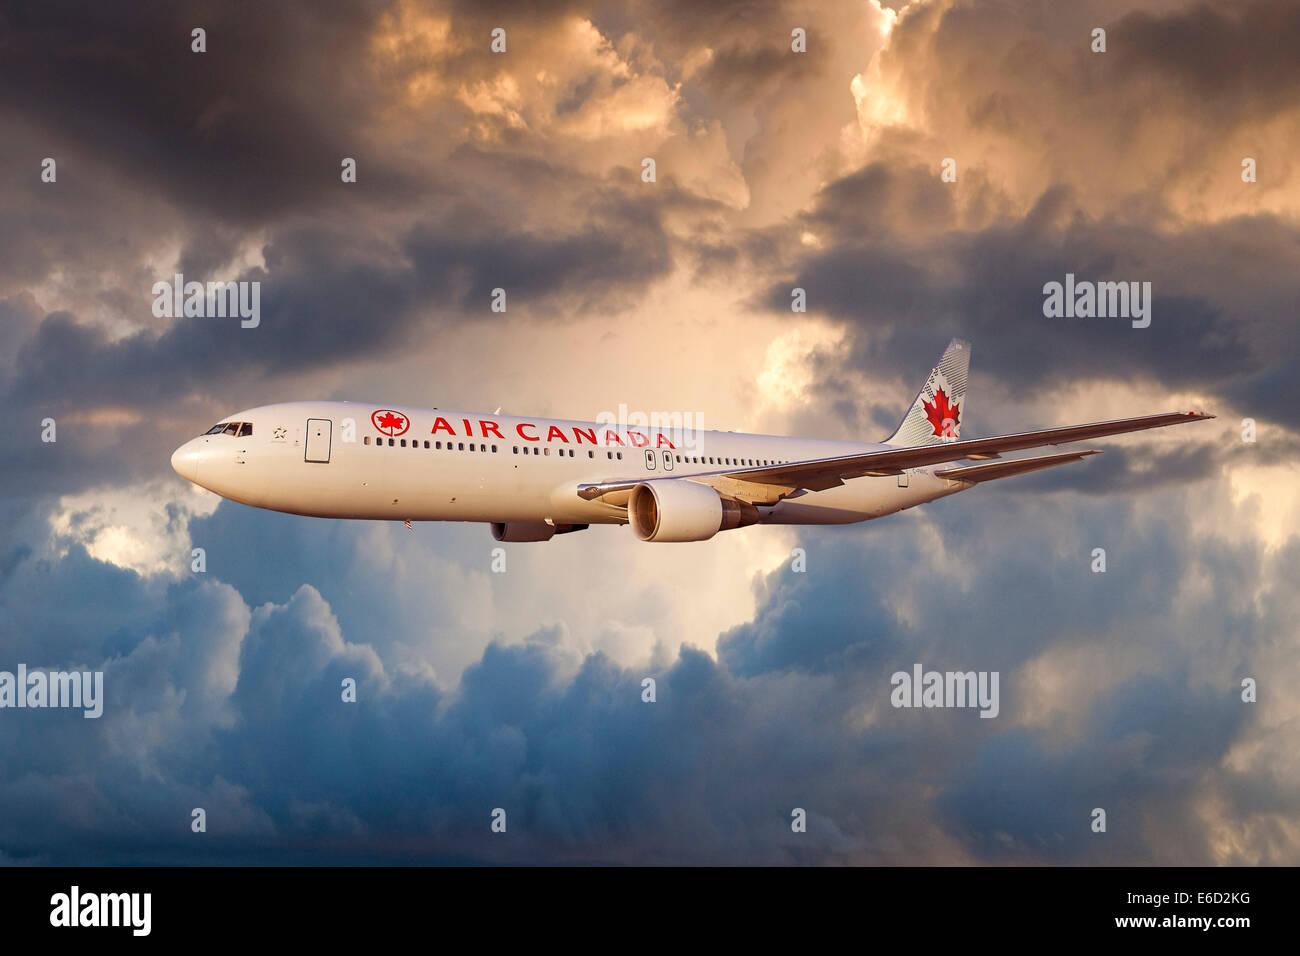 Air Canada Boeing 767-333 ER in flight - Stock Image